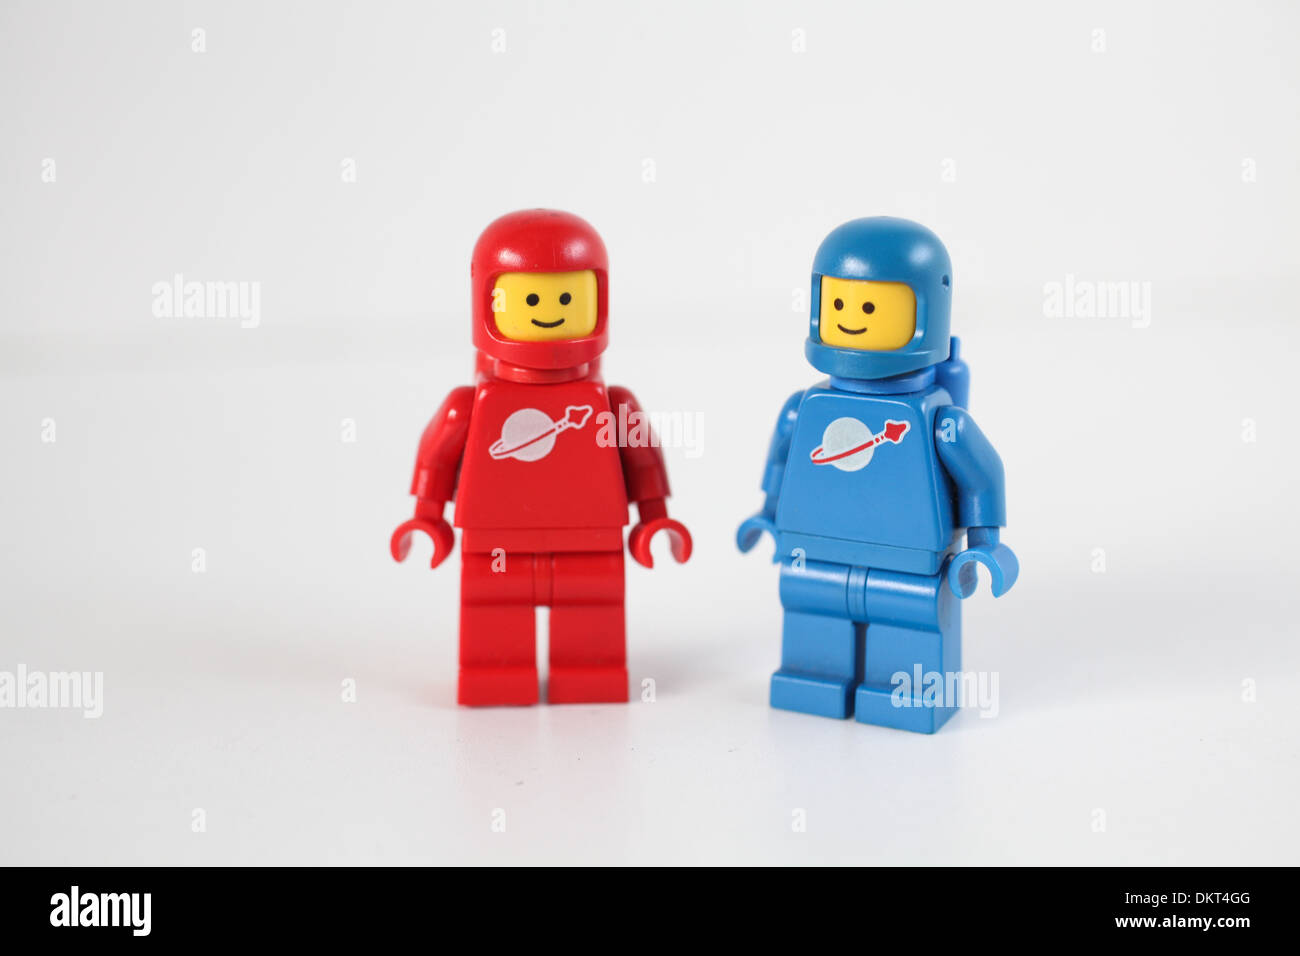 Lego Weltraum Figuren Stockfoto Bild 63840016 Alamy